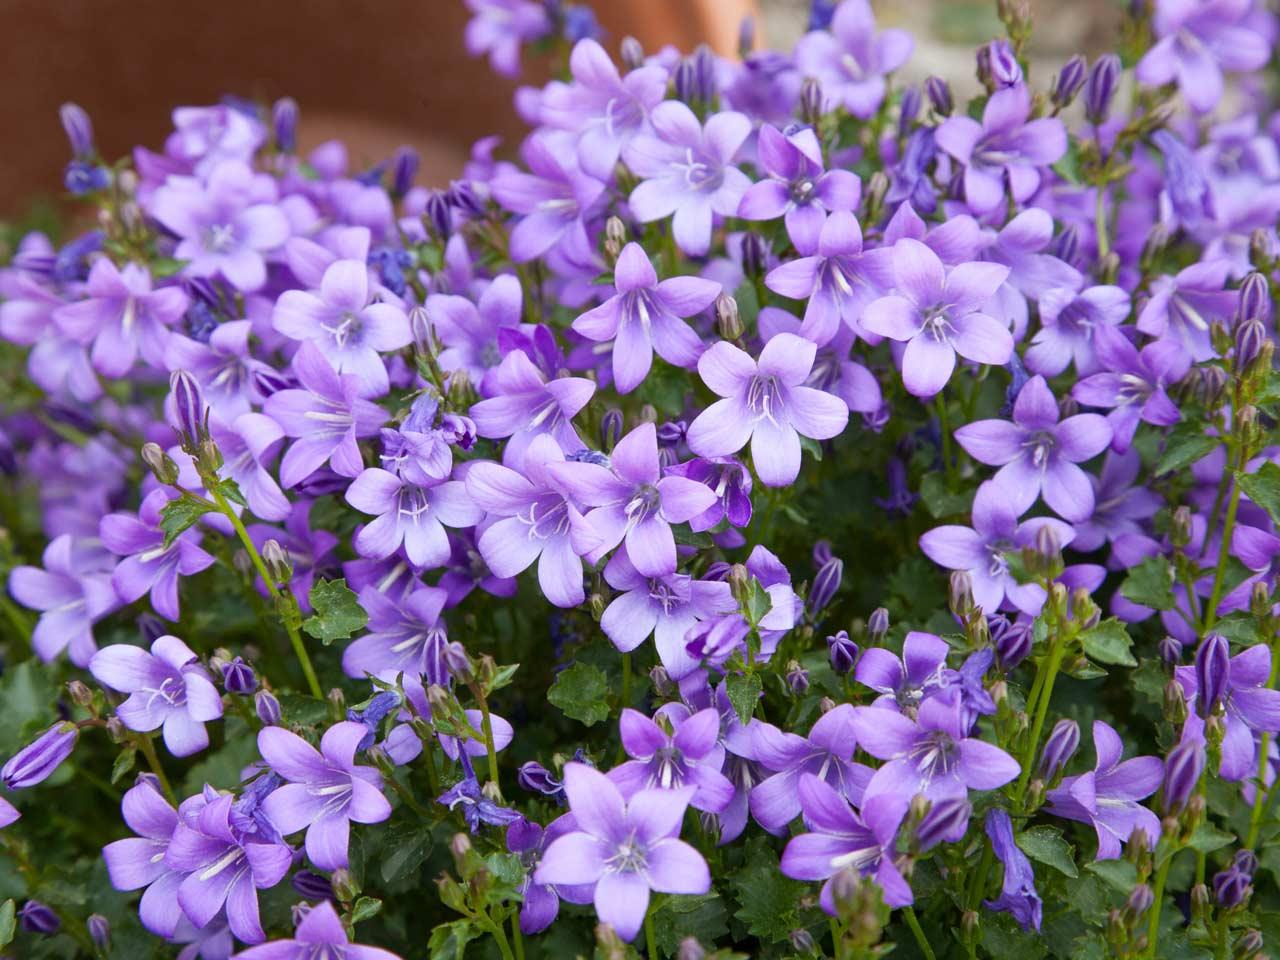 so nice natural Purple Flowers image